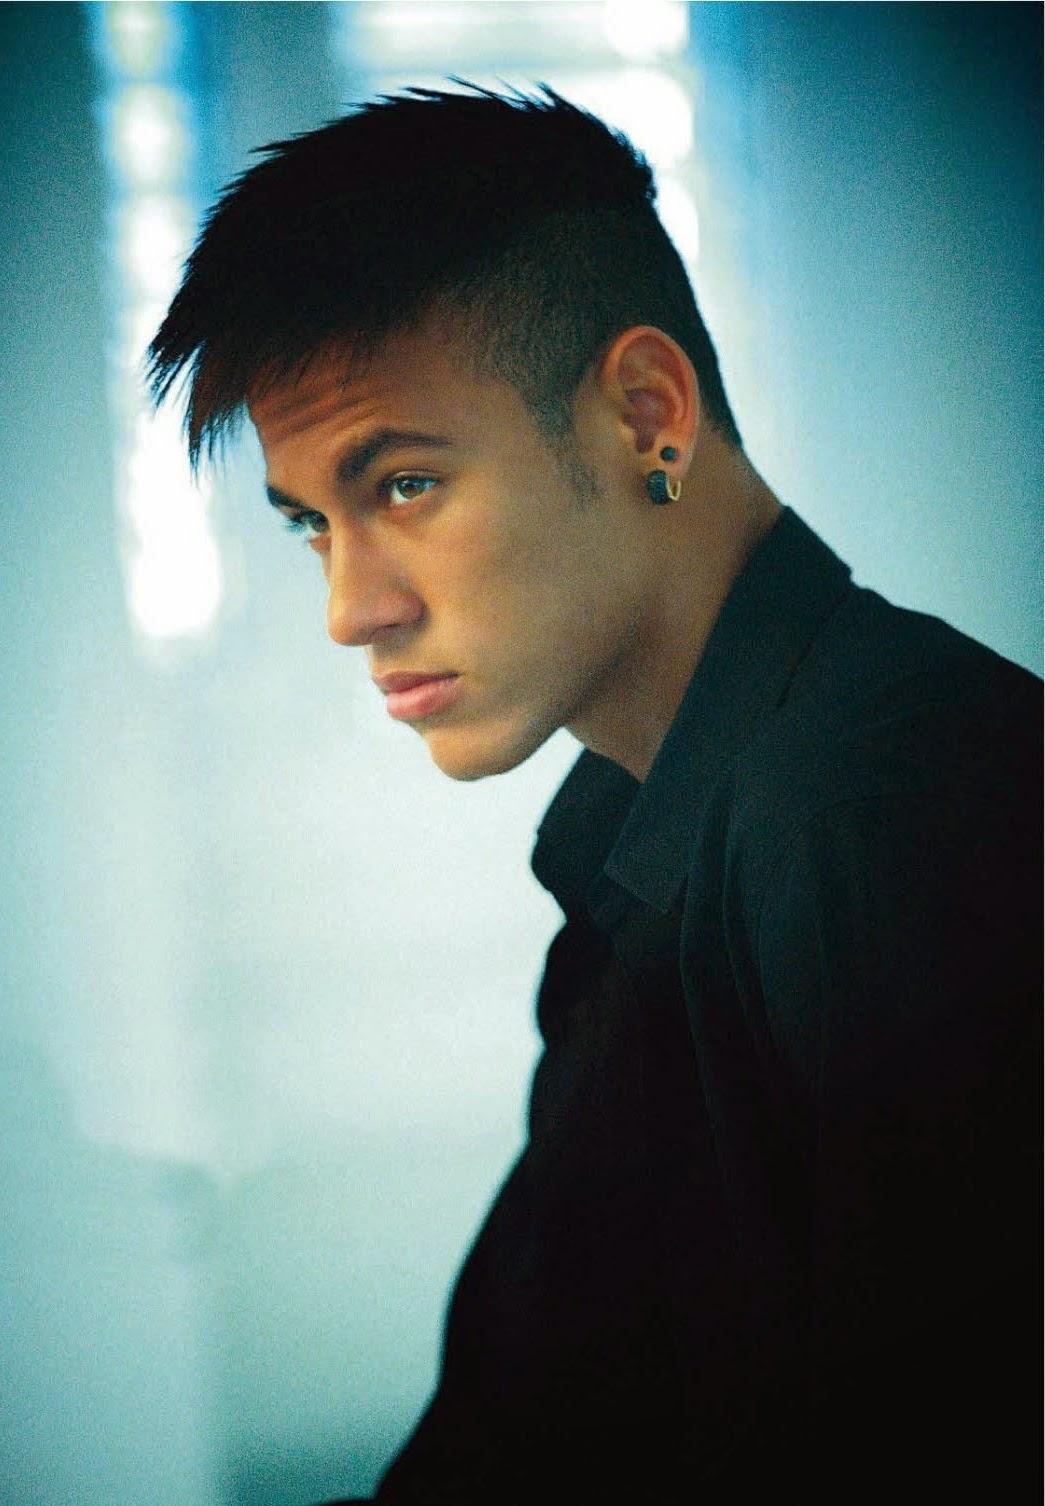 Gaya Rambut Mohawk Neymar